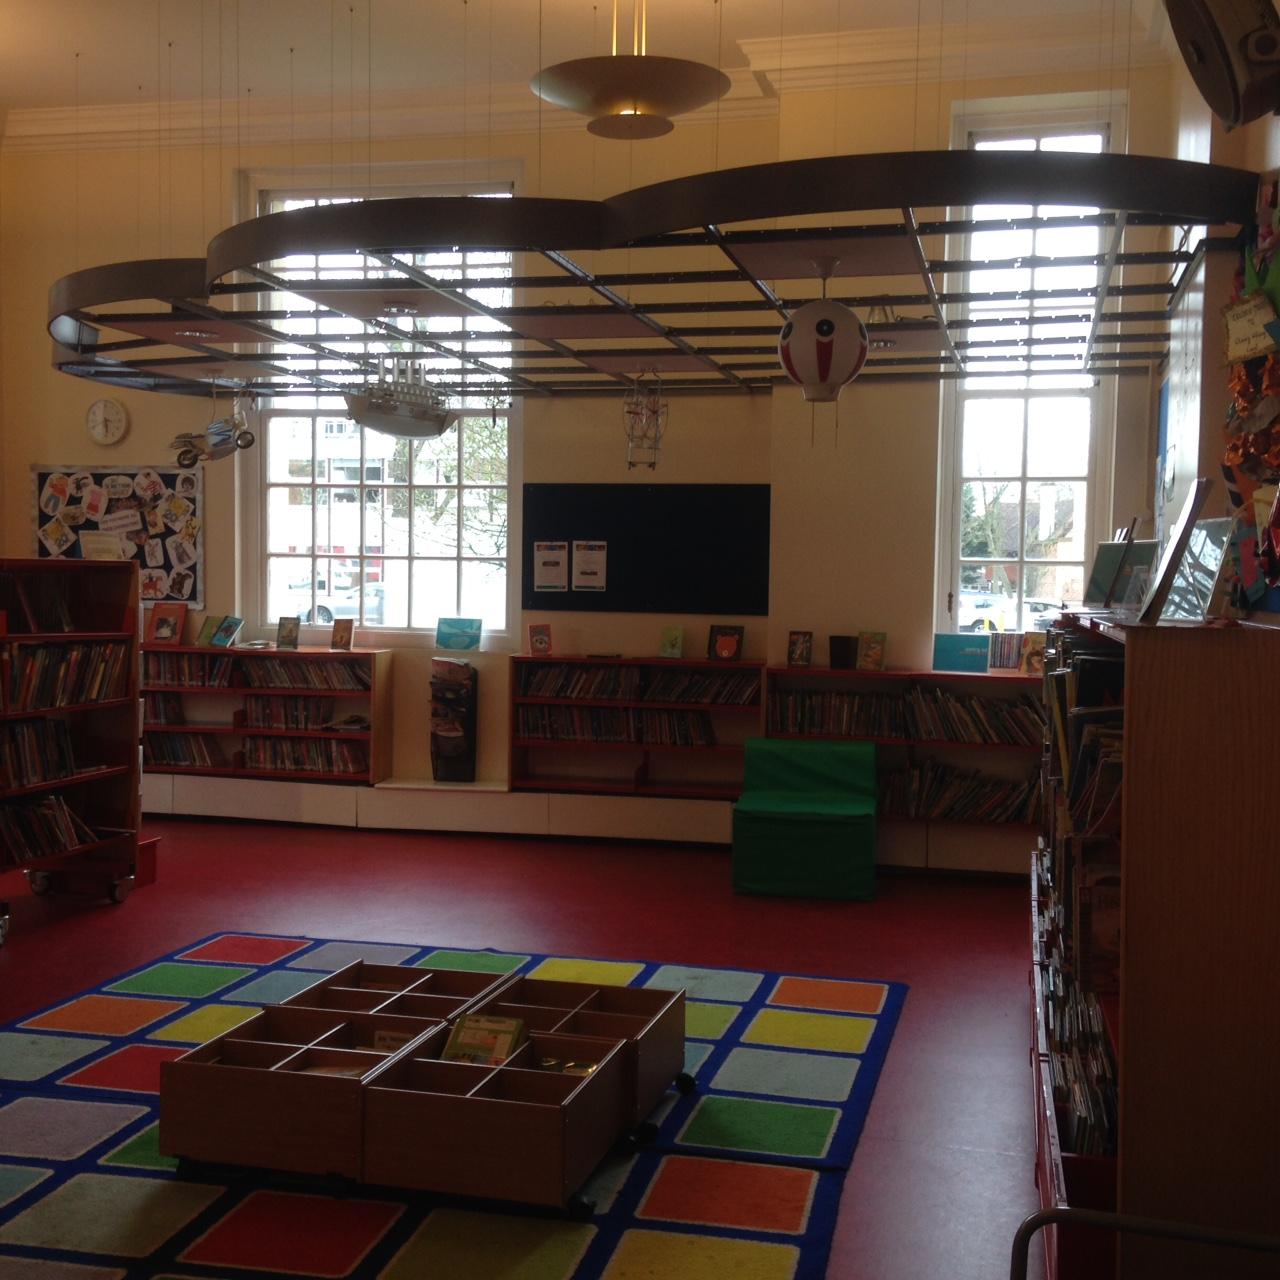 Broken Barnet: Barnet Libraries: The End